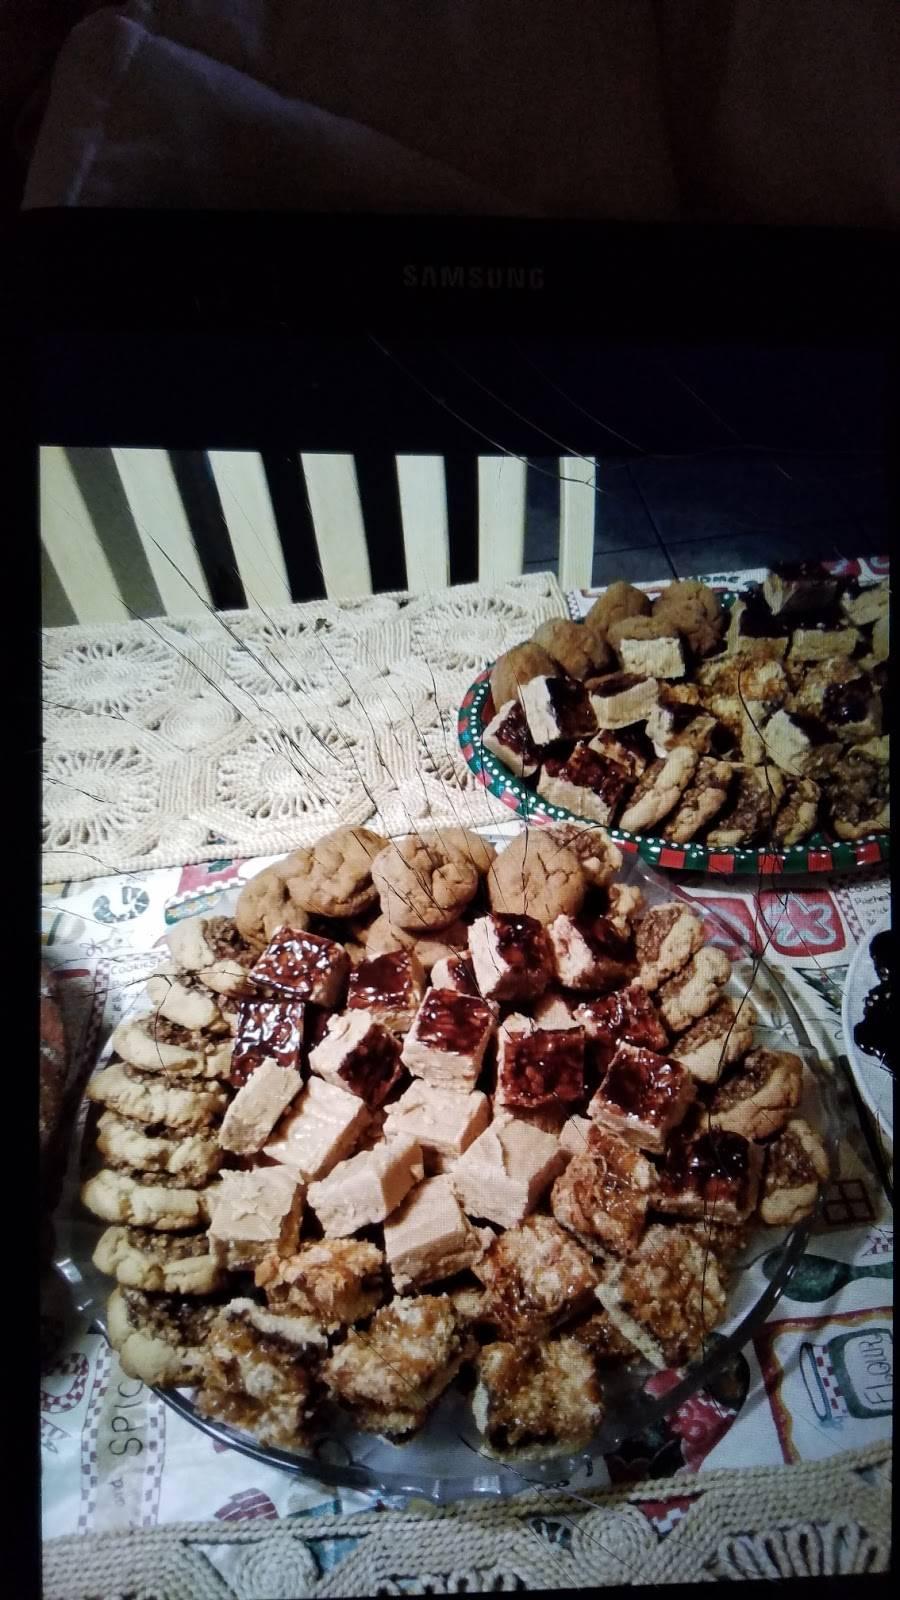 Money Mikes Hot Dogs LLC - meal takeaway  | Photo 10 of 10 | Address: E Redfield Rd, Gilbert, AZ 85234, USA | Phone: (480) 559-4735